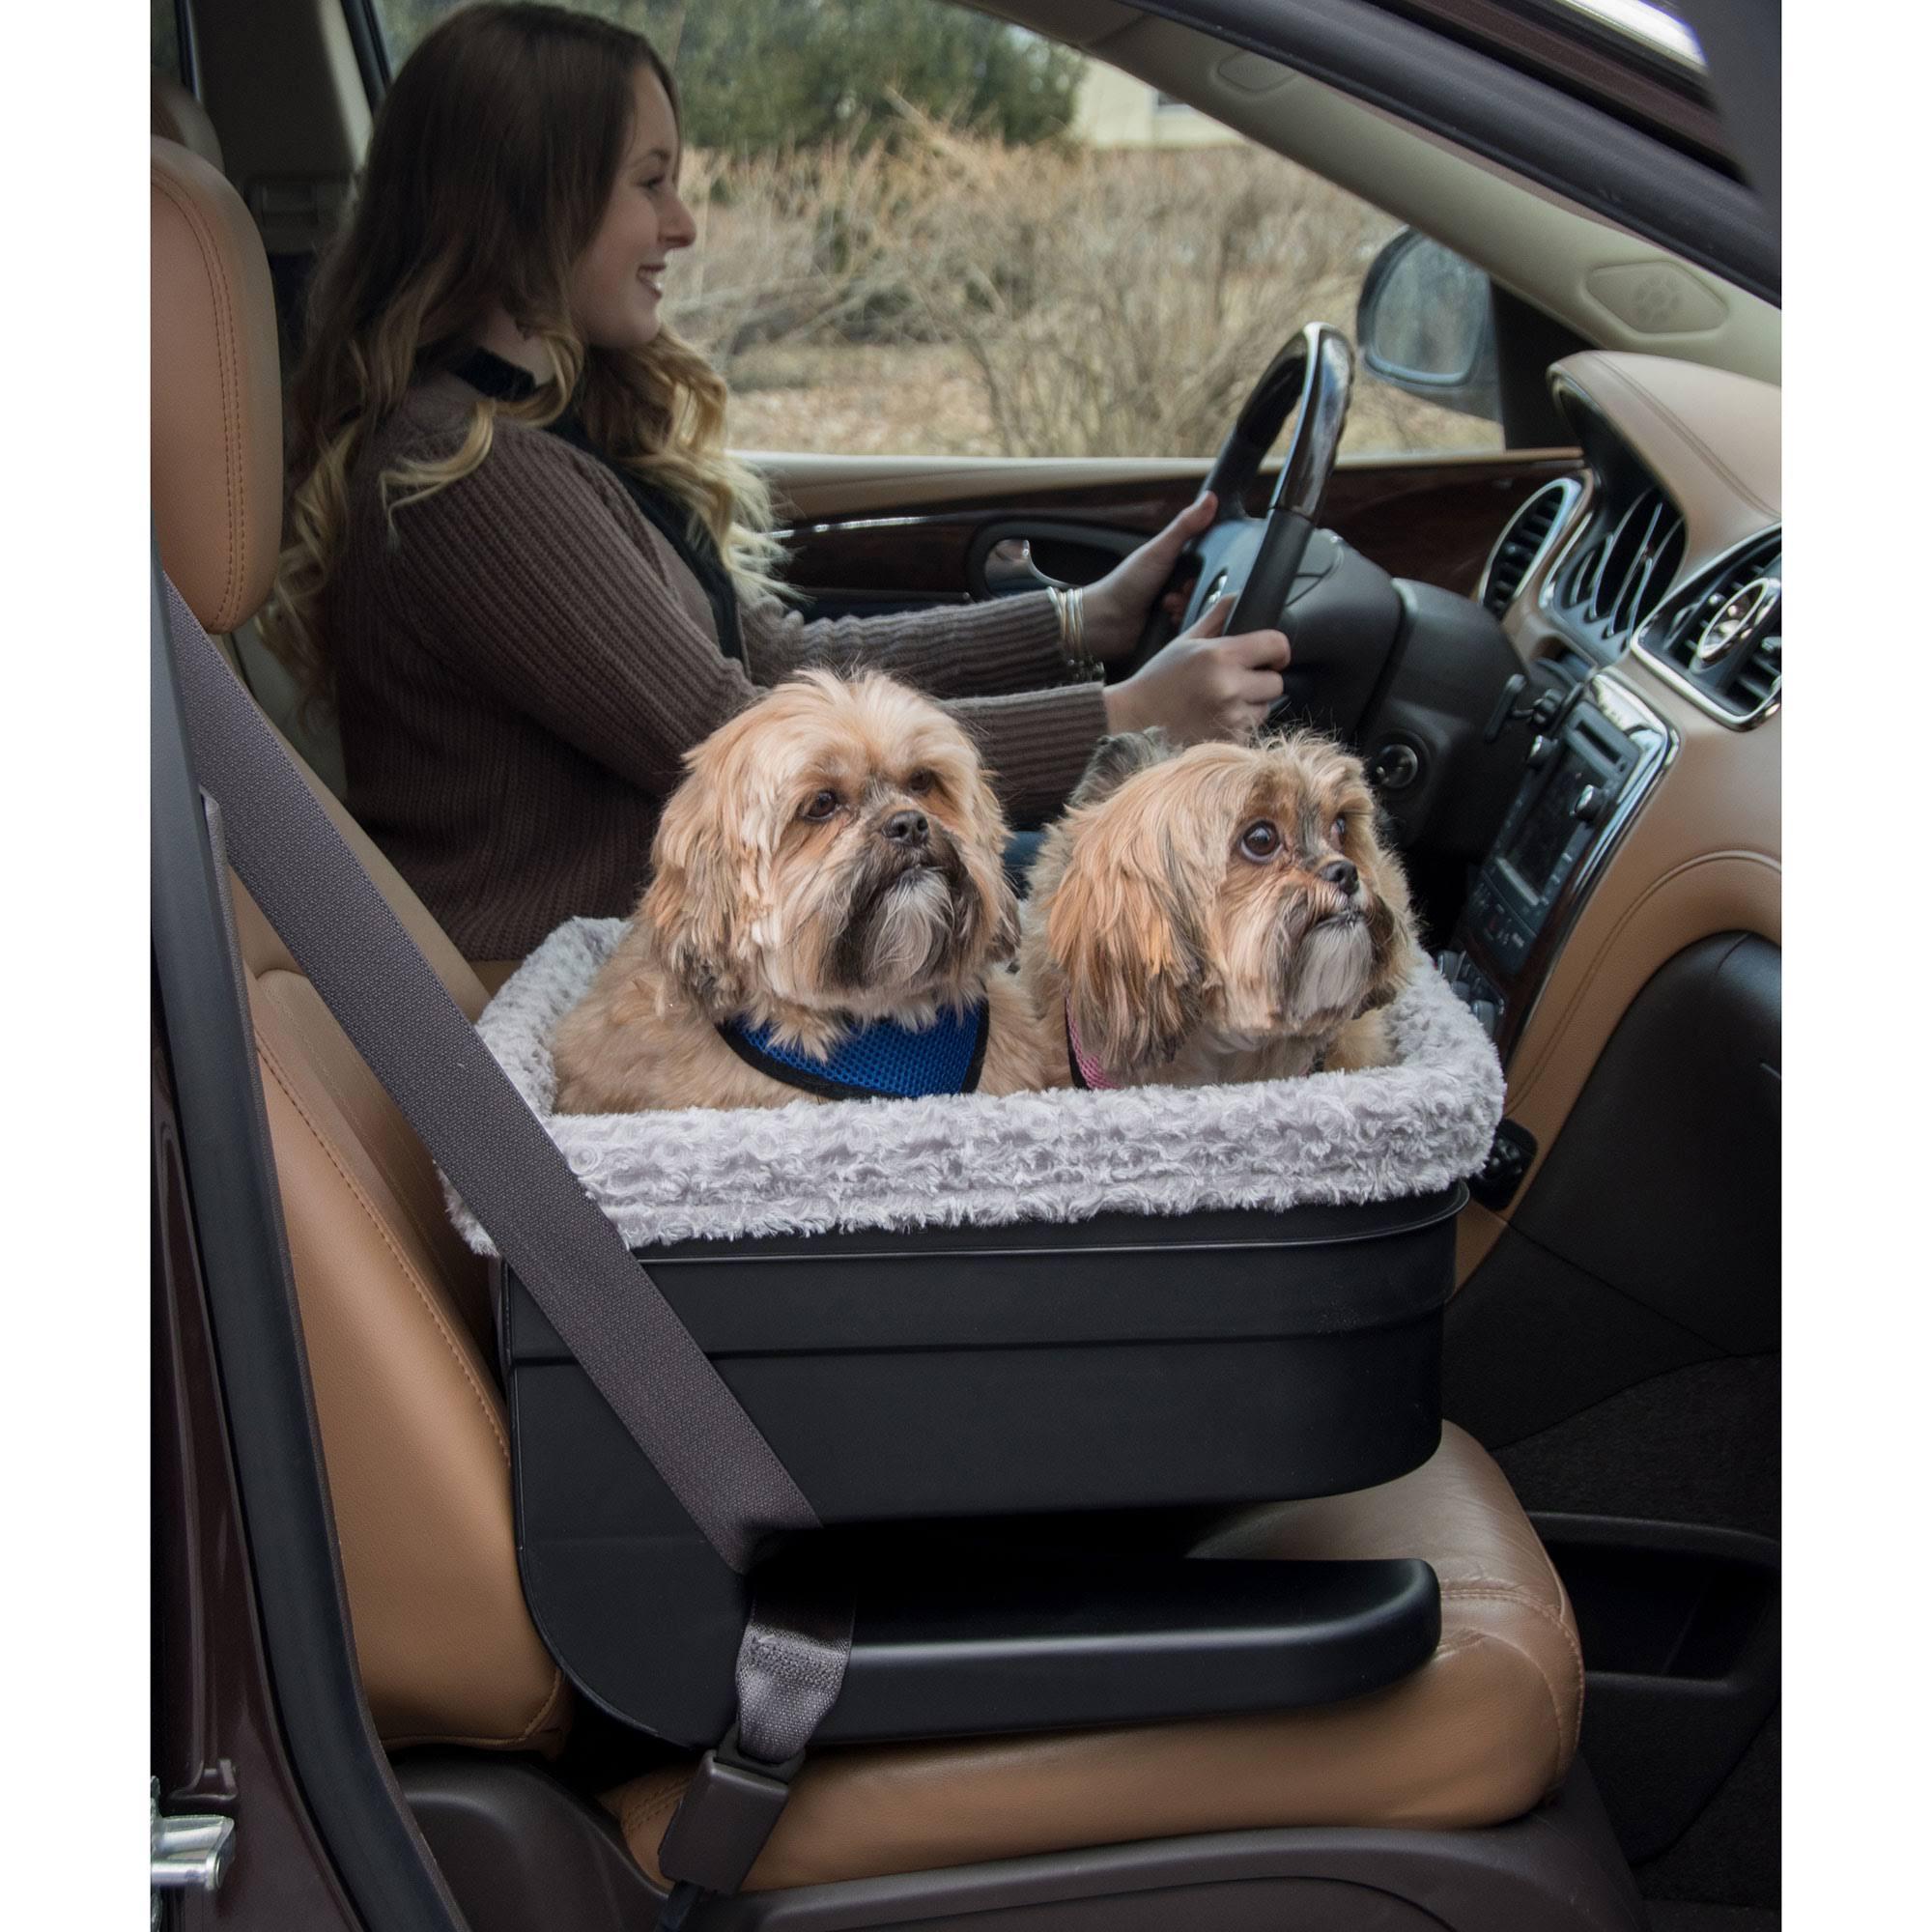 Nebeleinsatz Mit 20 Pet Bucket Nebel Autositz Booster Schwarz Gear qwRHXTxz